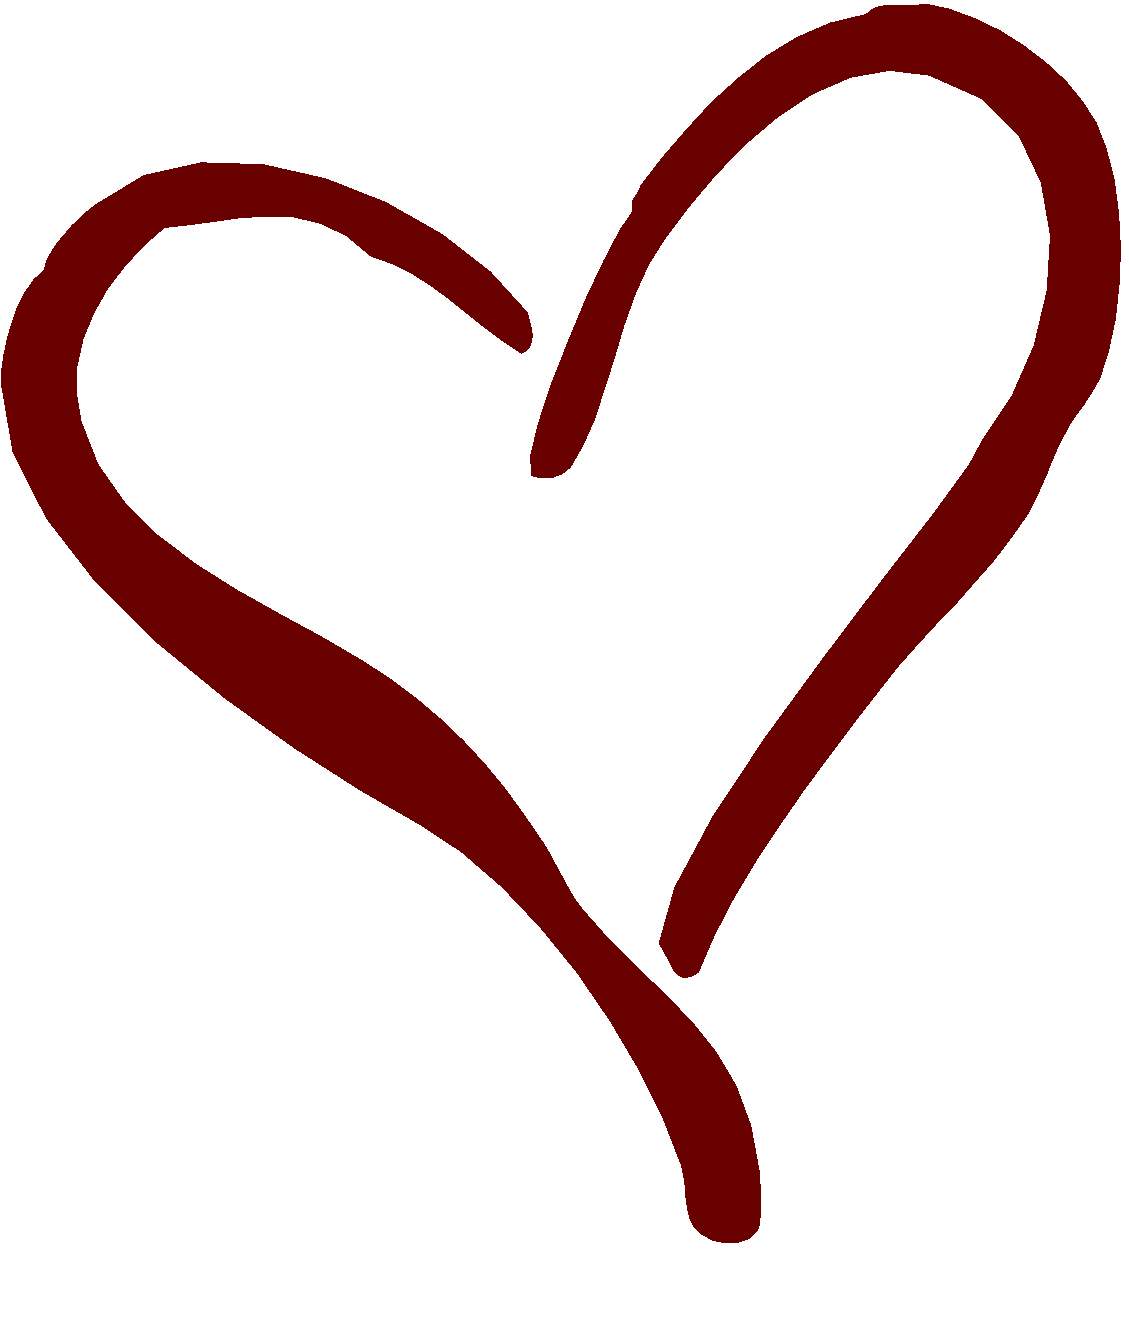 Heart Outline Clip Art Di7exgg4t Jpeg